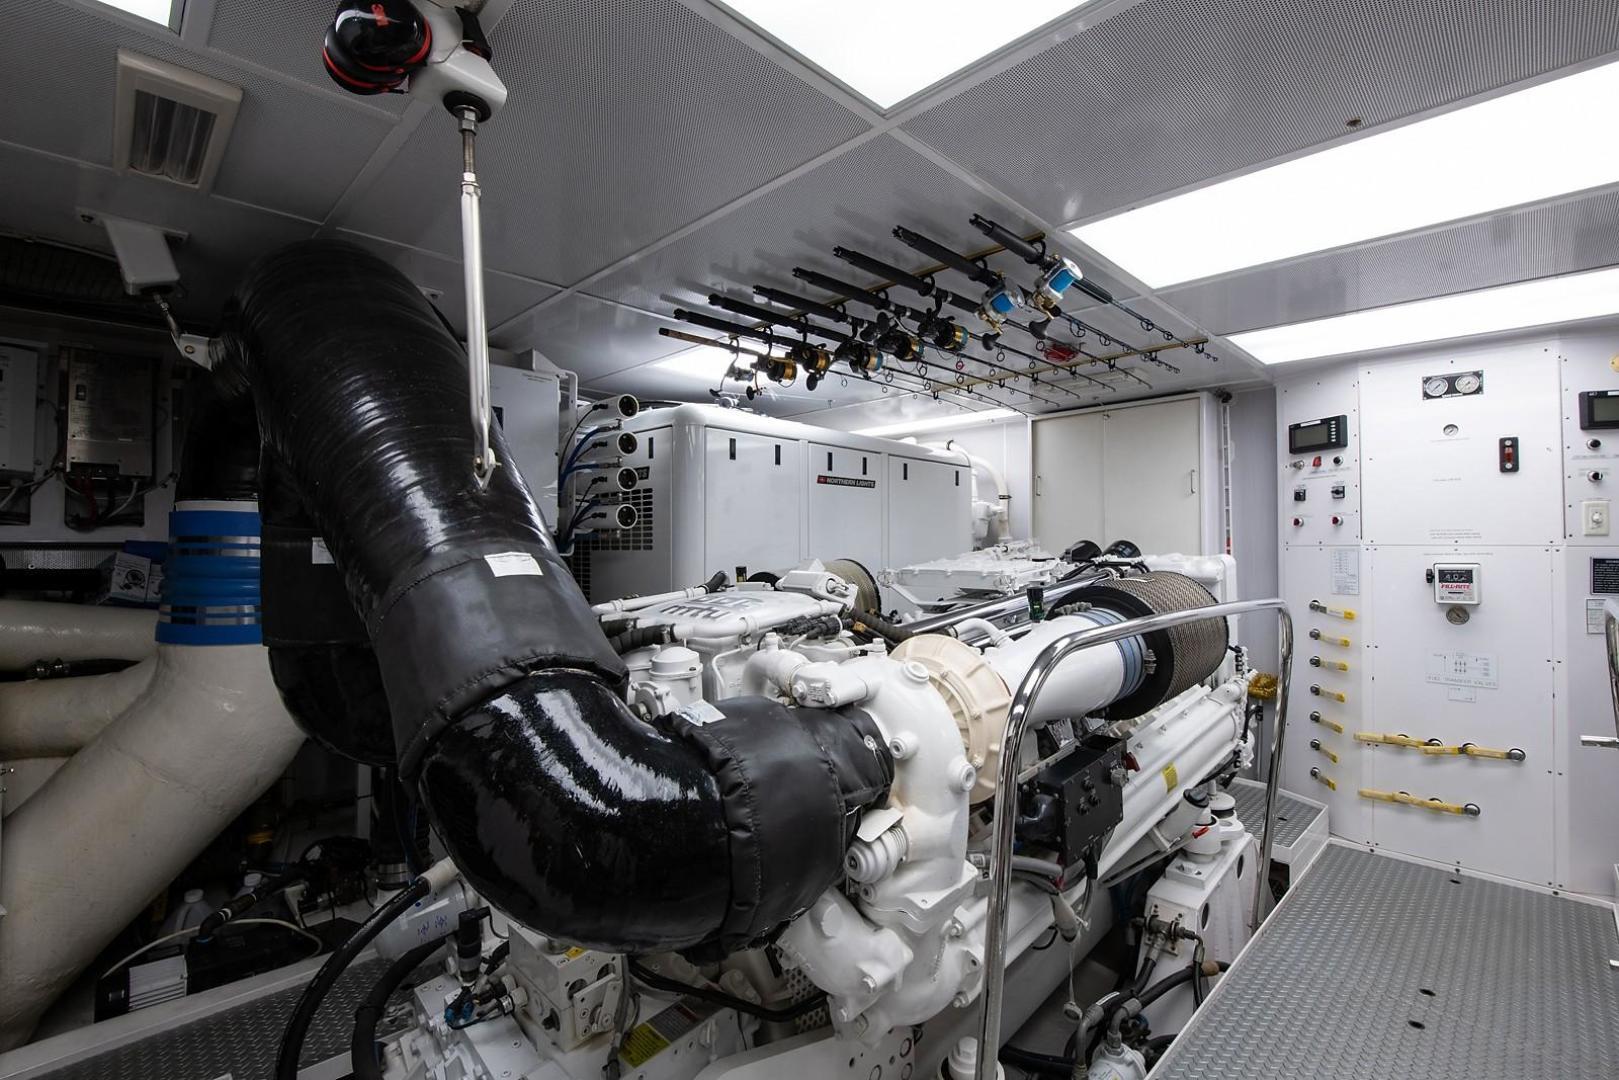 Westport-Motoryacht 2010-Cavallino Fort Lauderdale-Florida-United States-Engine Room-1270080 | Thumbnail